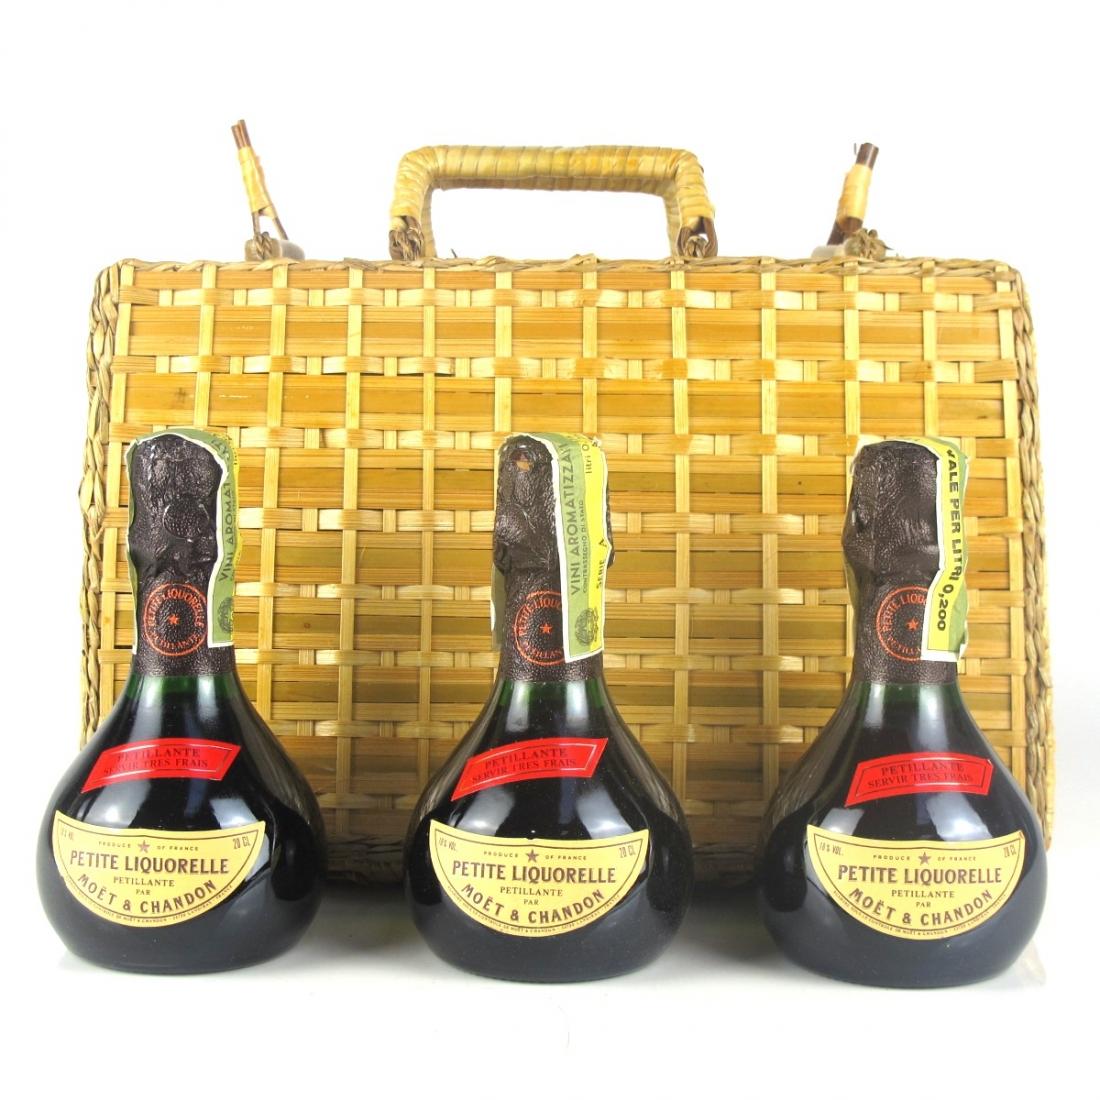 Moet & Chandon Petite Liquorelle Petillante 3x20cl / Wicker Hamper